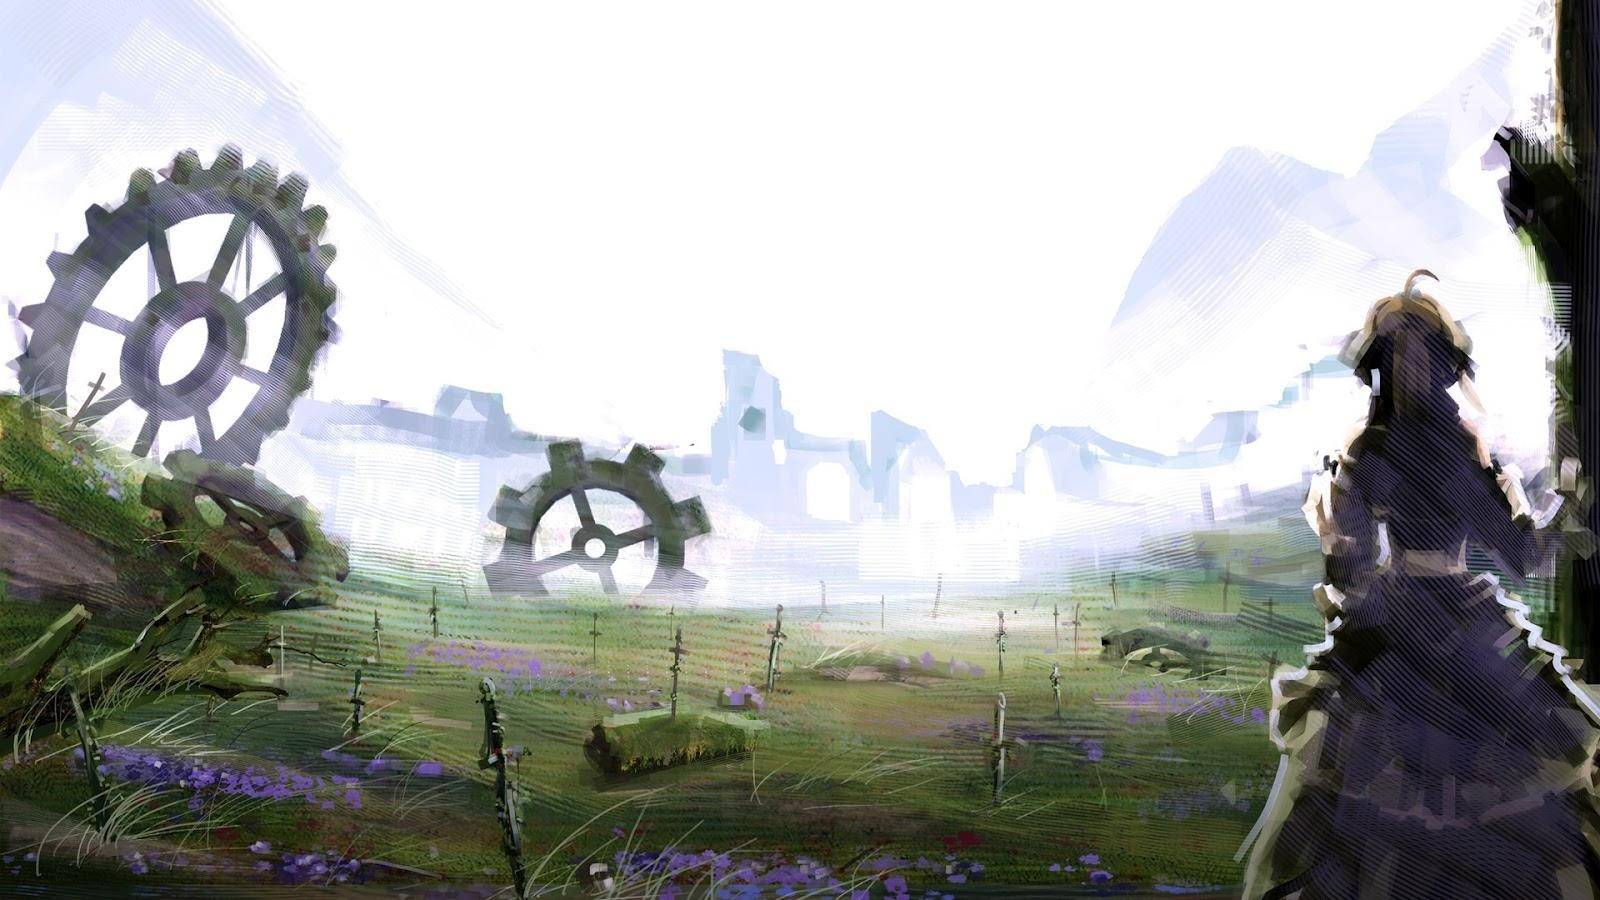 http://1.bp.blogspot.com/-4jfg8C8dD_s/T7kjnGSlPWI/AAAAAAAABHM/oGM8dkhMbbY/s1600/Animated+HD+wallpaper.jpg